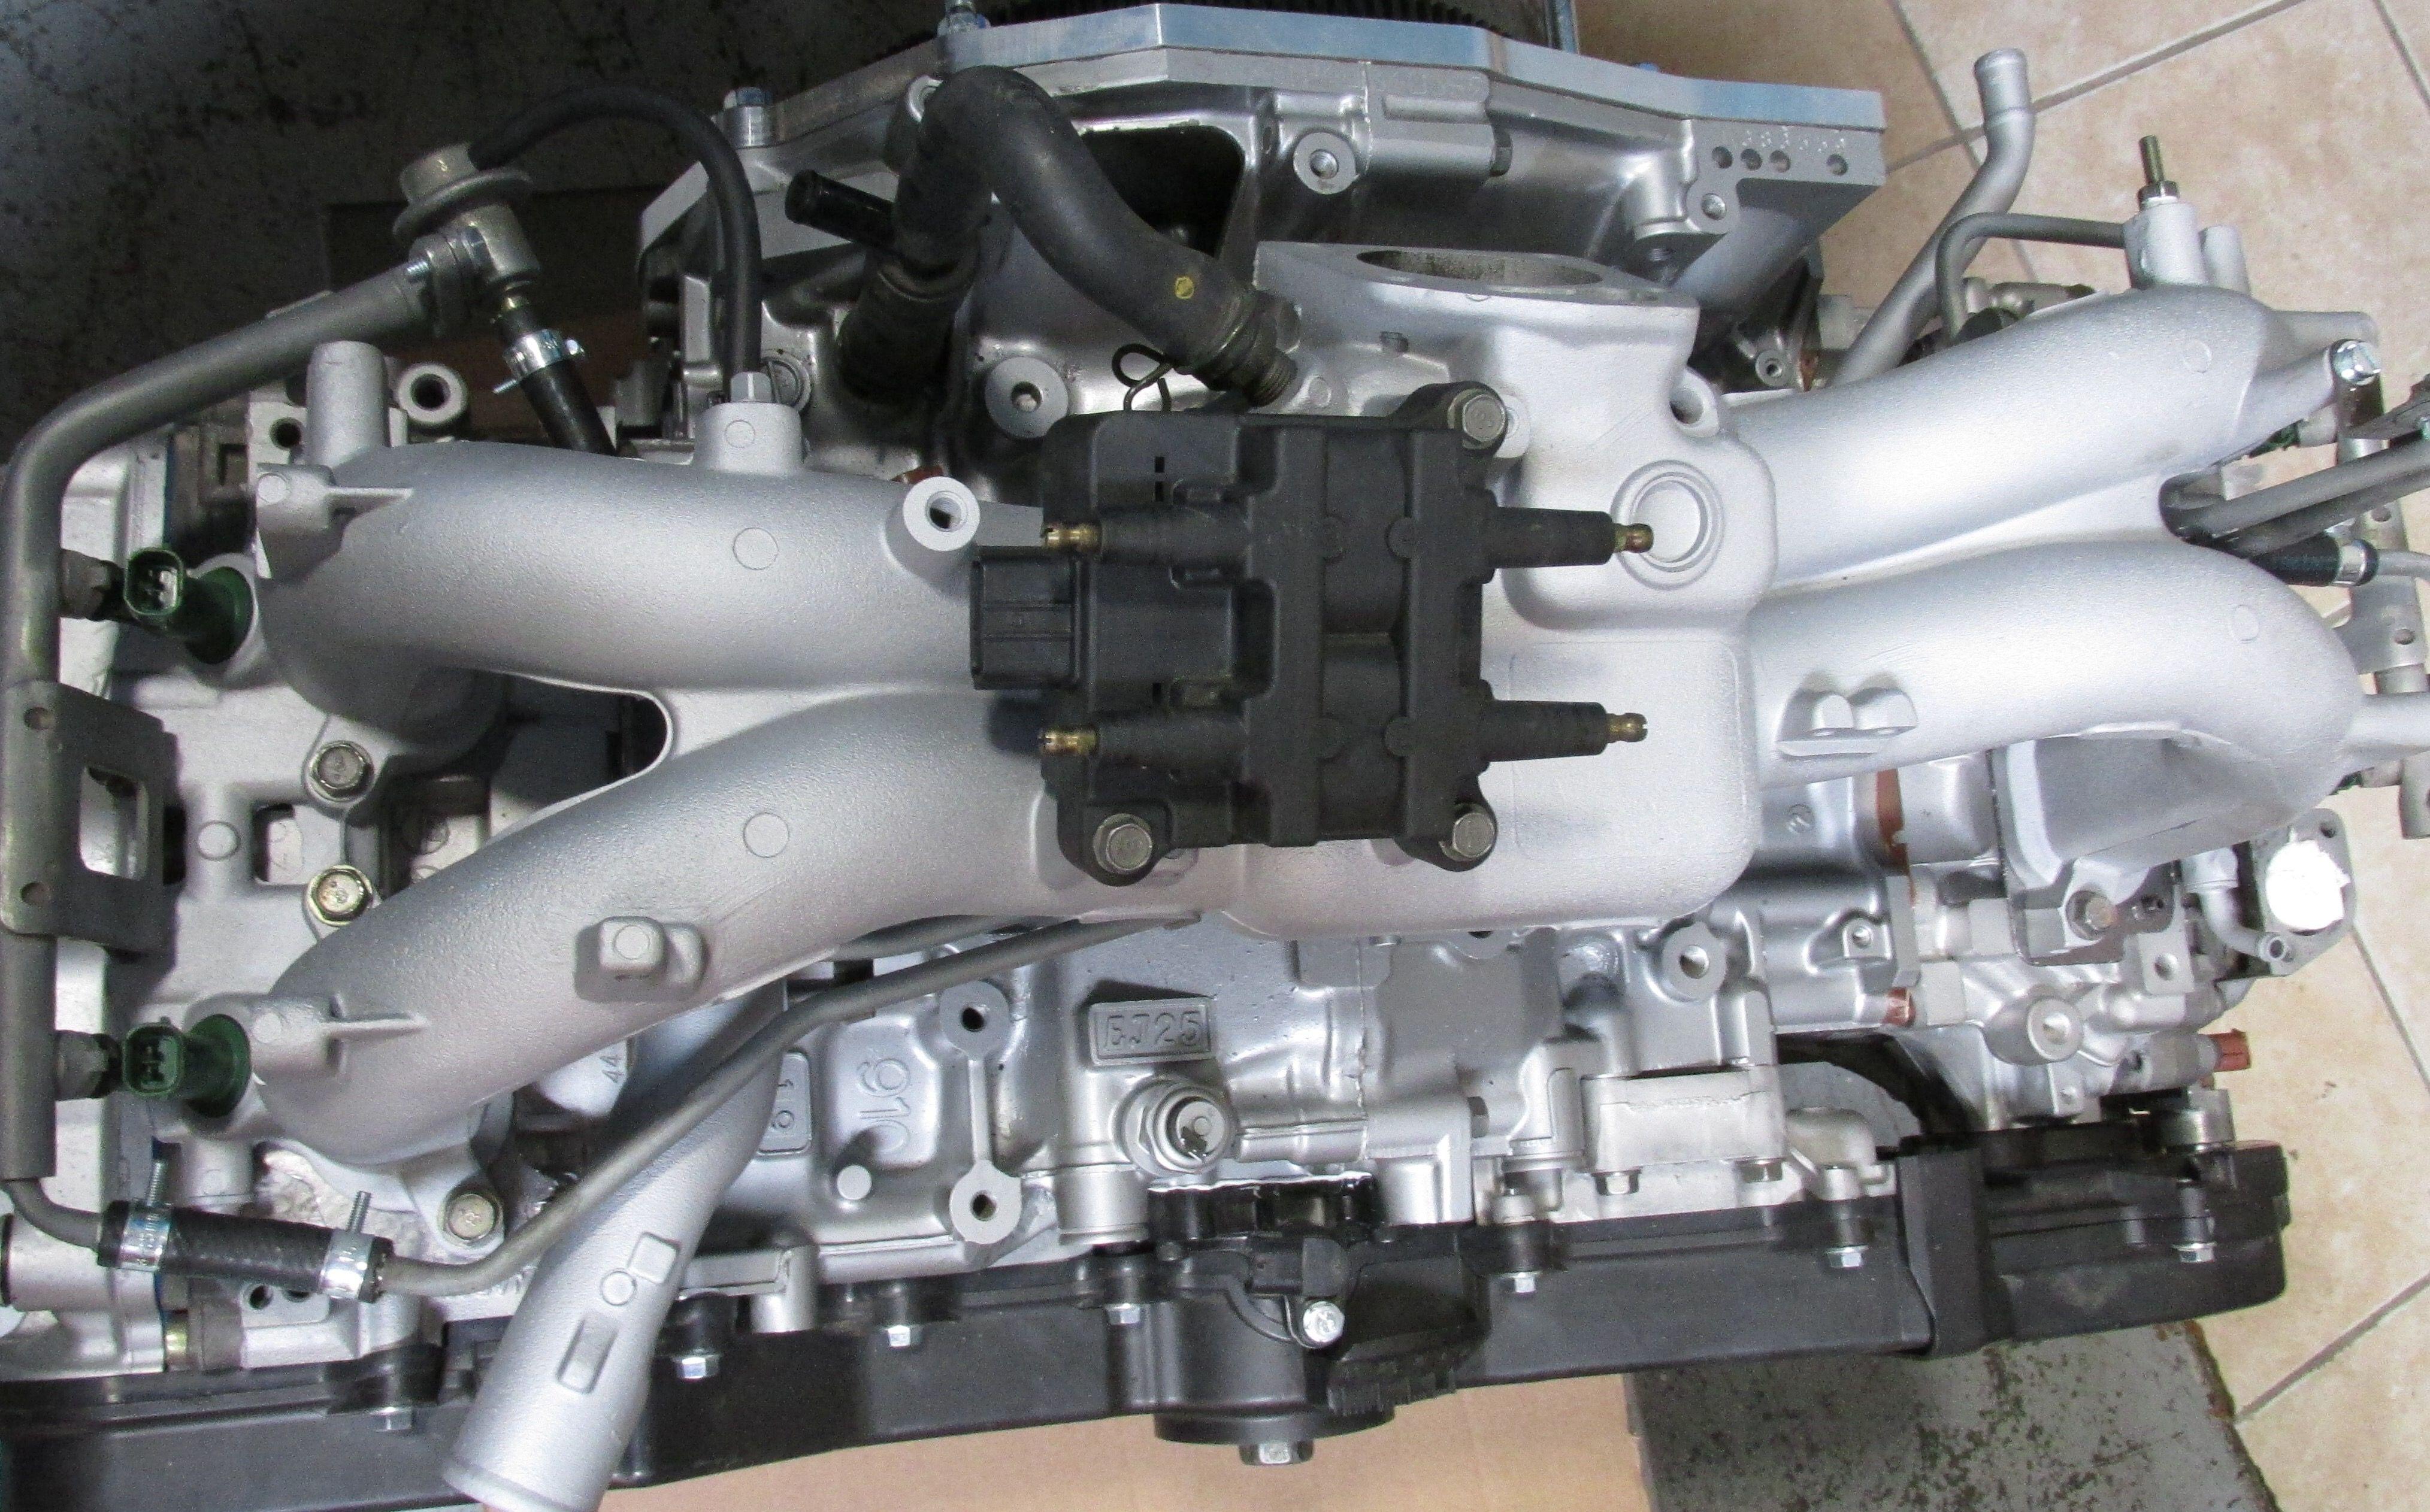 Vw Dune Buggy Subaru Conversion - Year of Clean Water